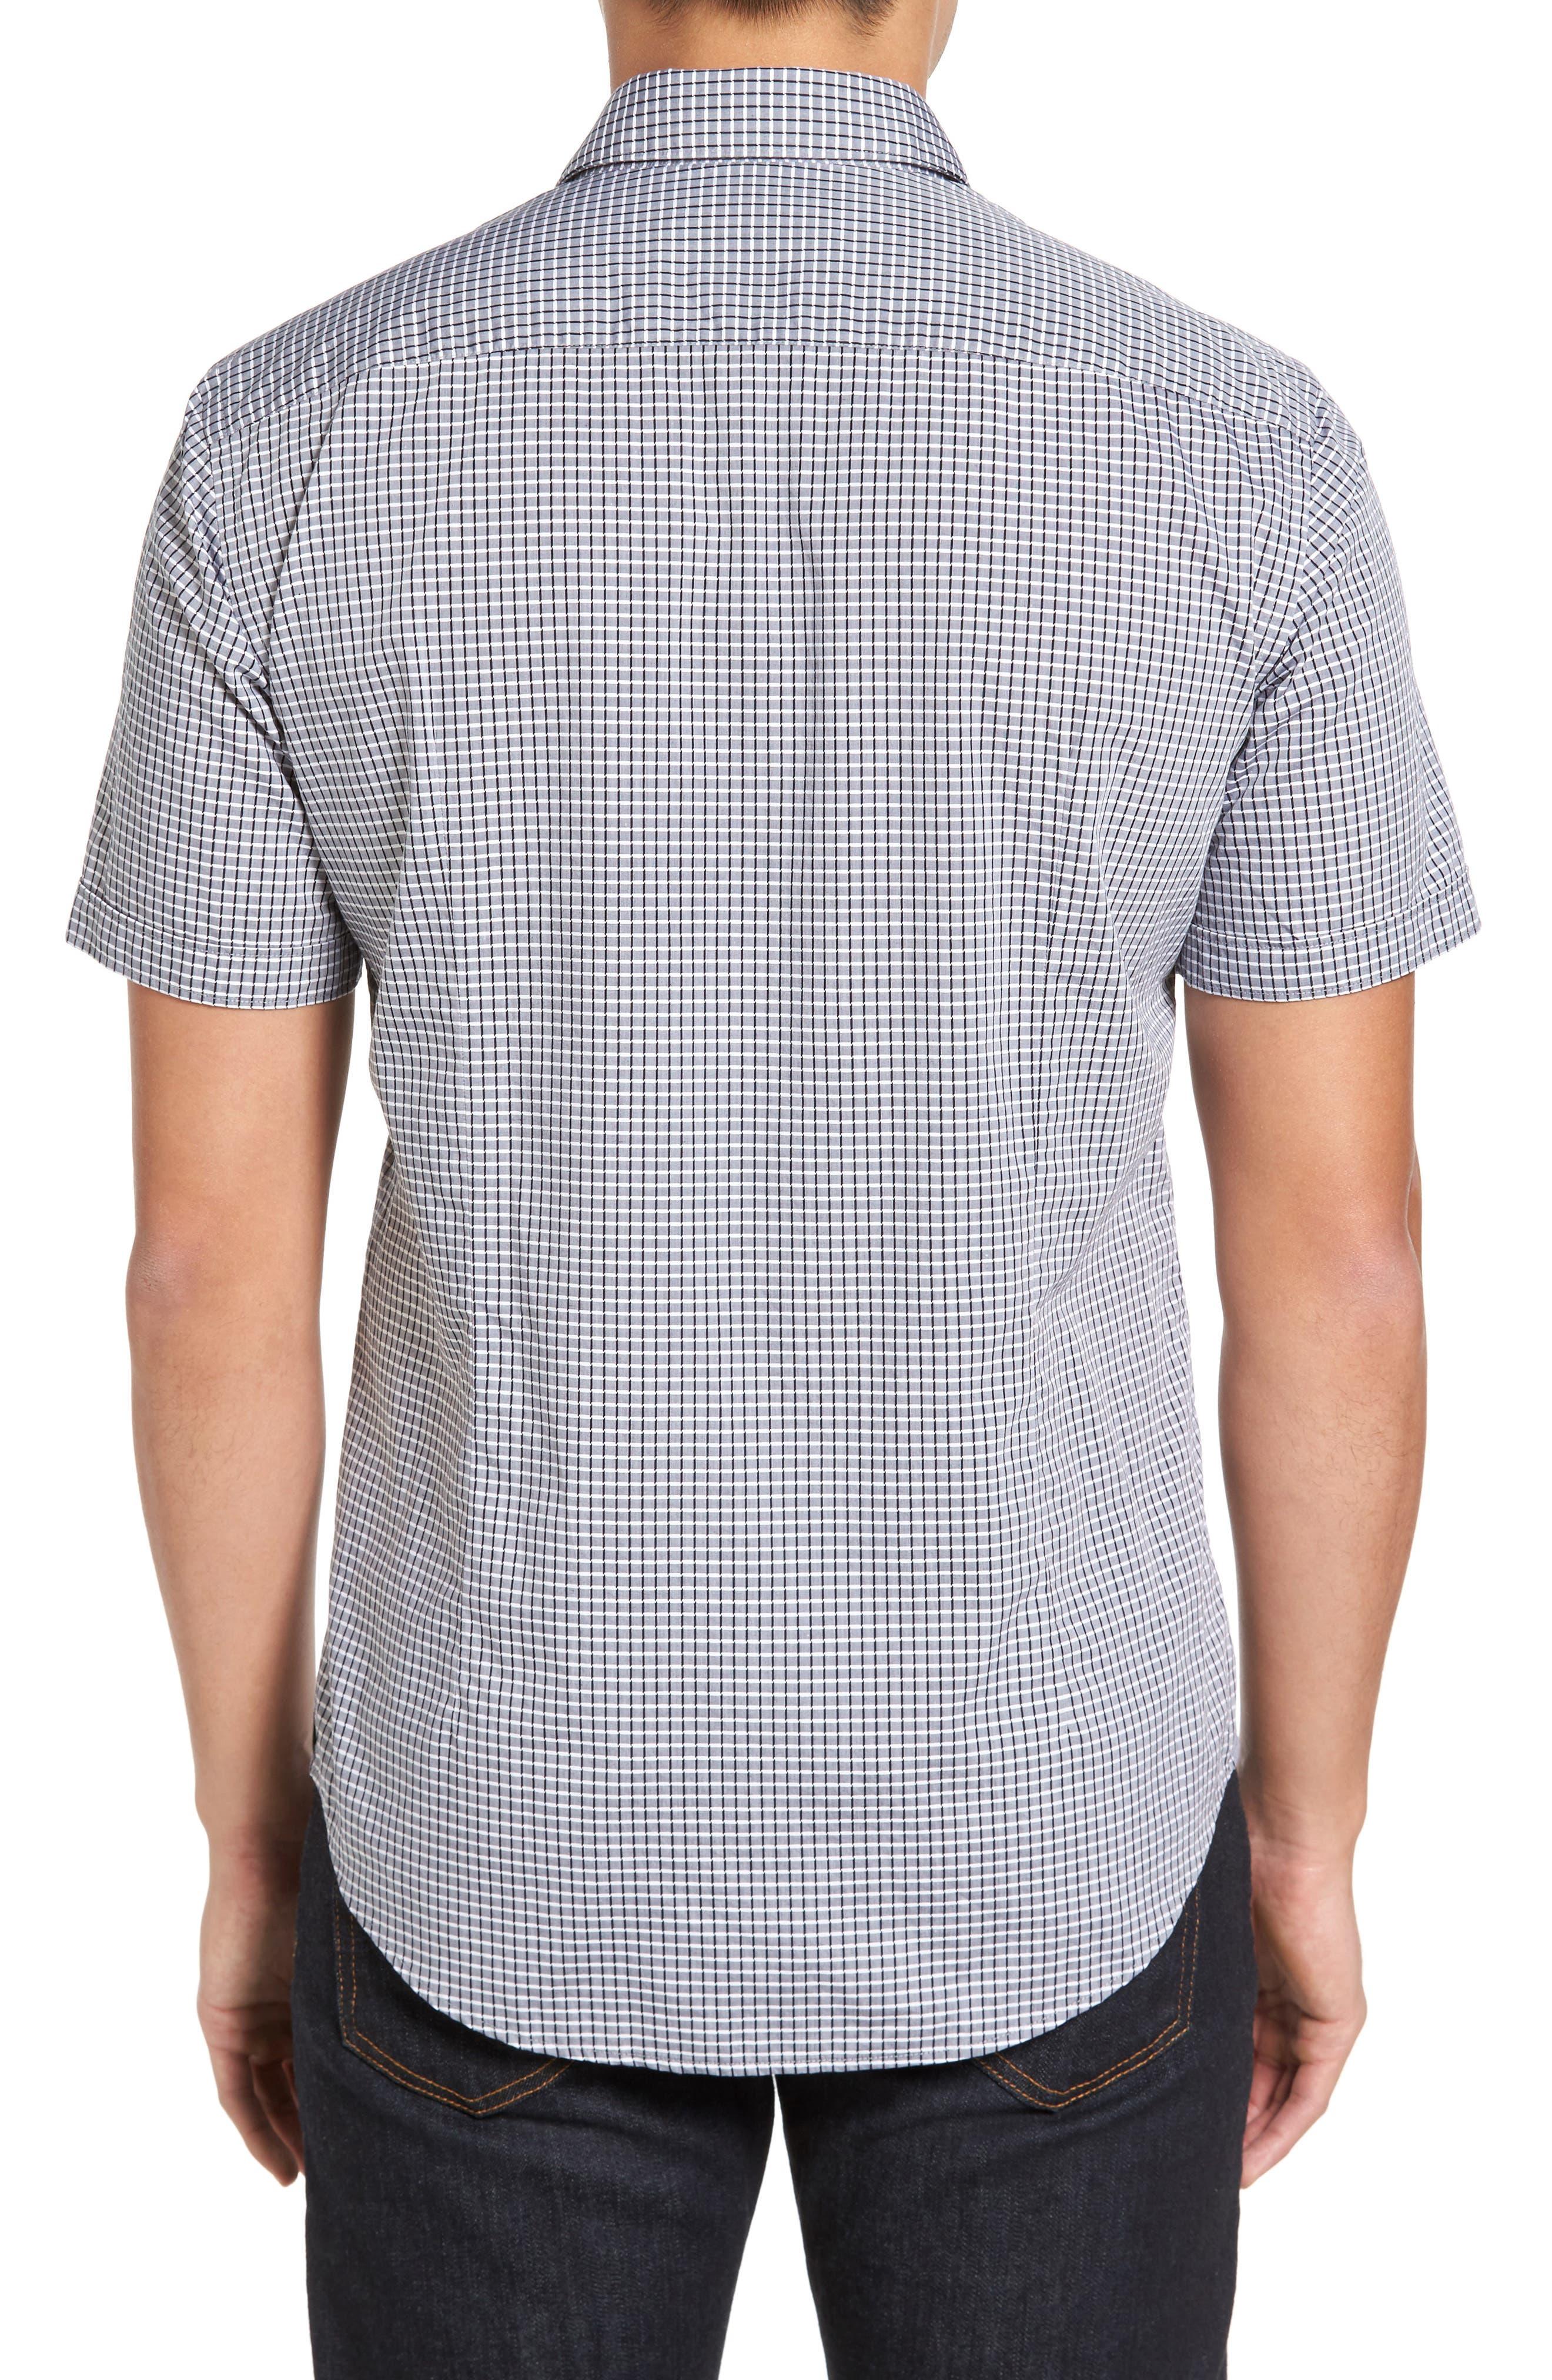 Ronn Check Sport Shirt,                             Alternate thumbnail 2, color,                             402